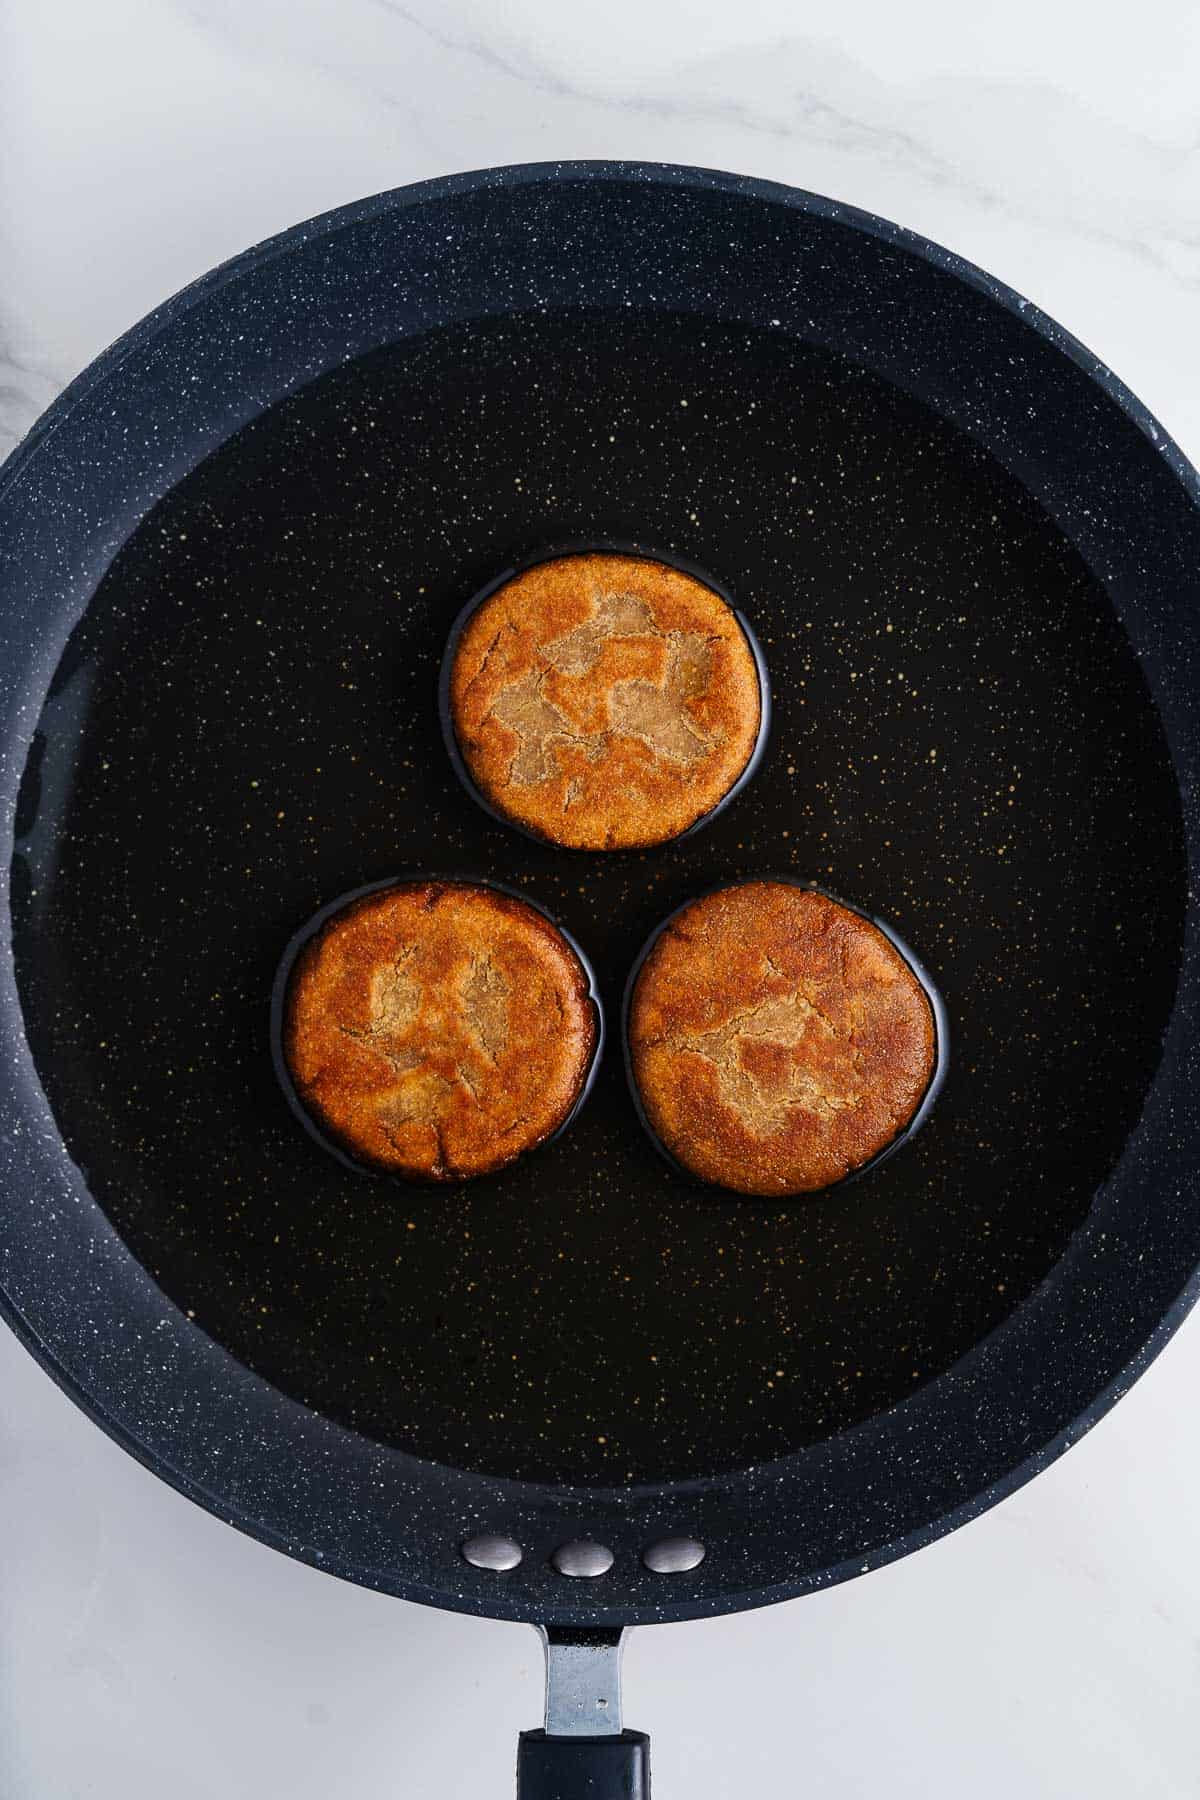 Gorditas de Piloncillo in a Pan of Oil